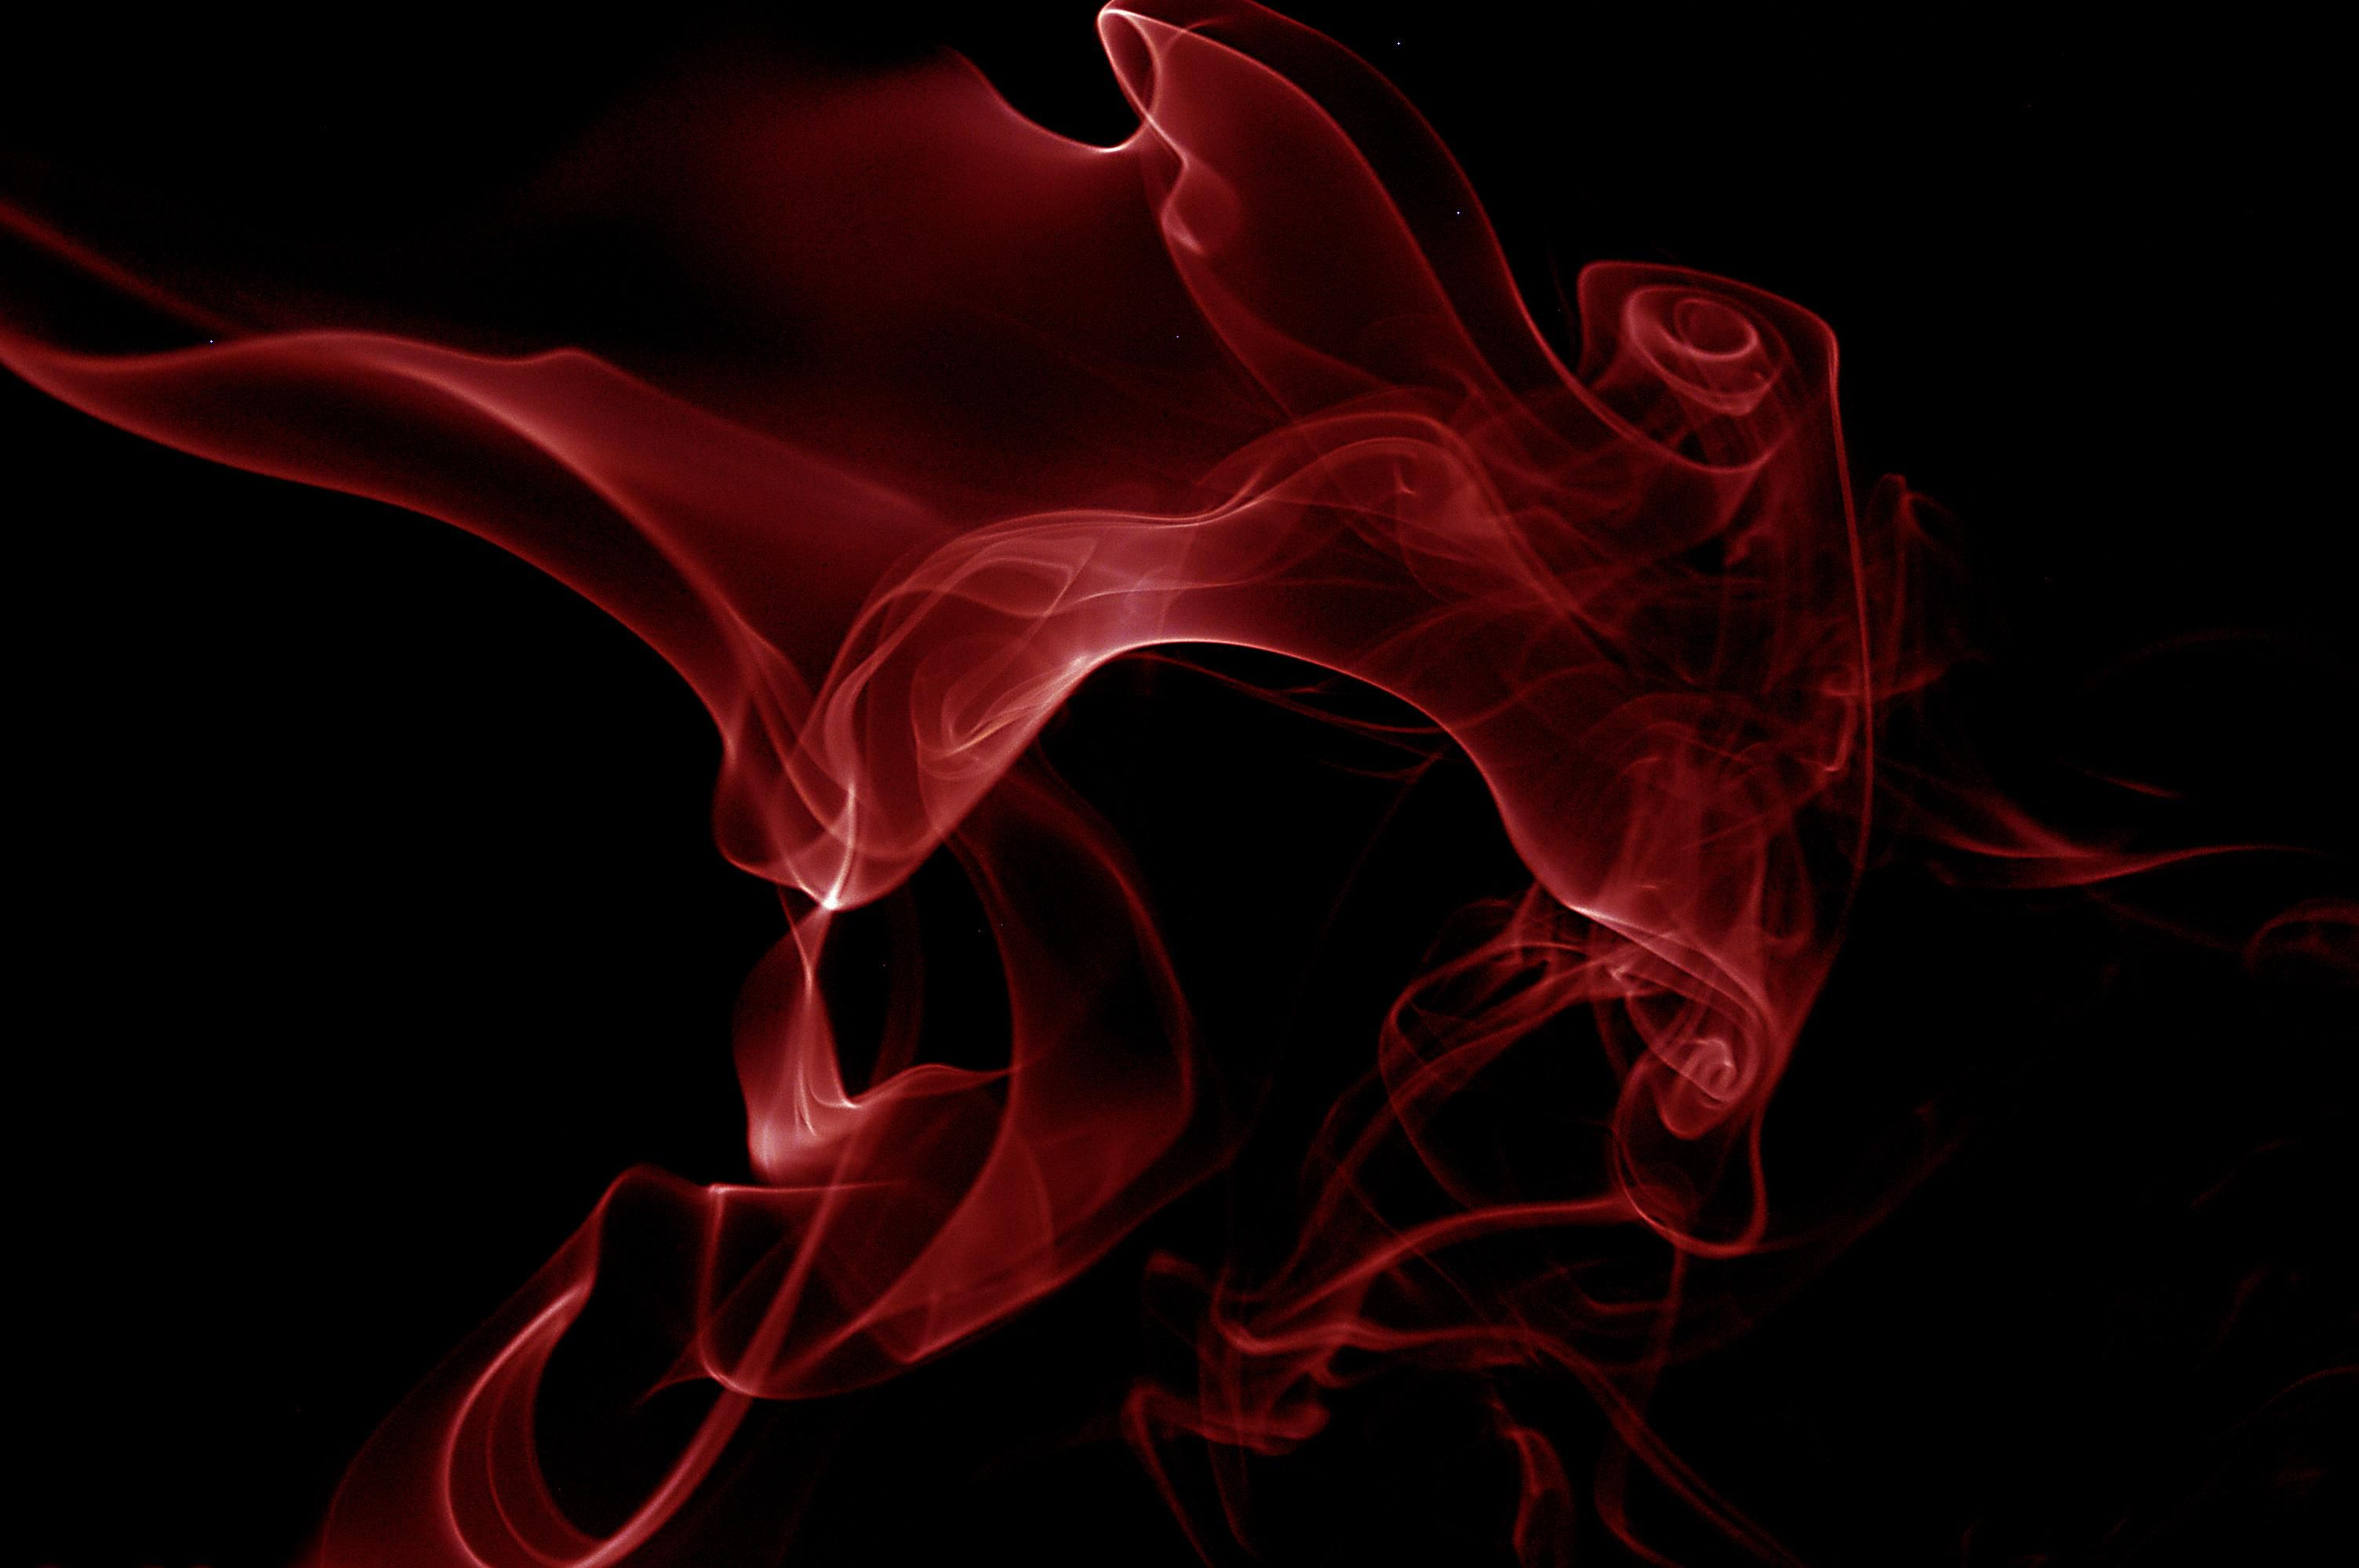 Red And Black Smoke Background Smoke Background Smoke Wallpaper Black Smoke